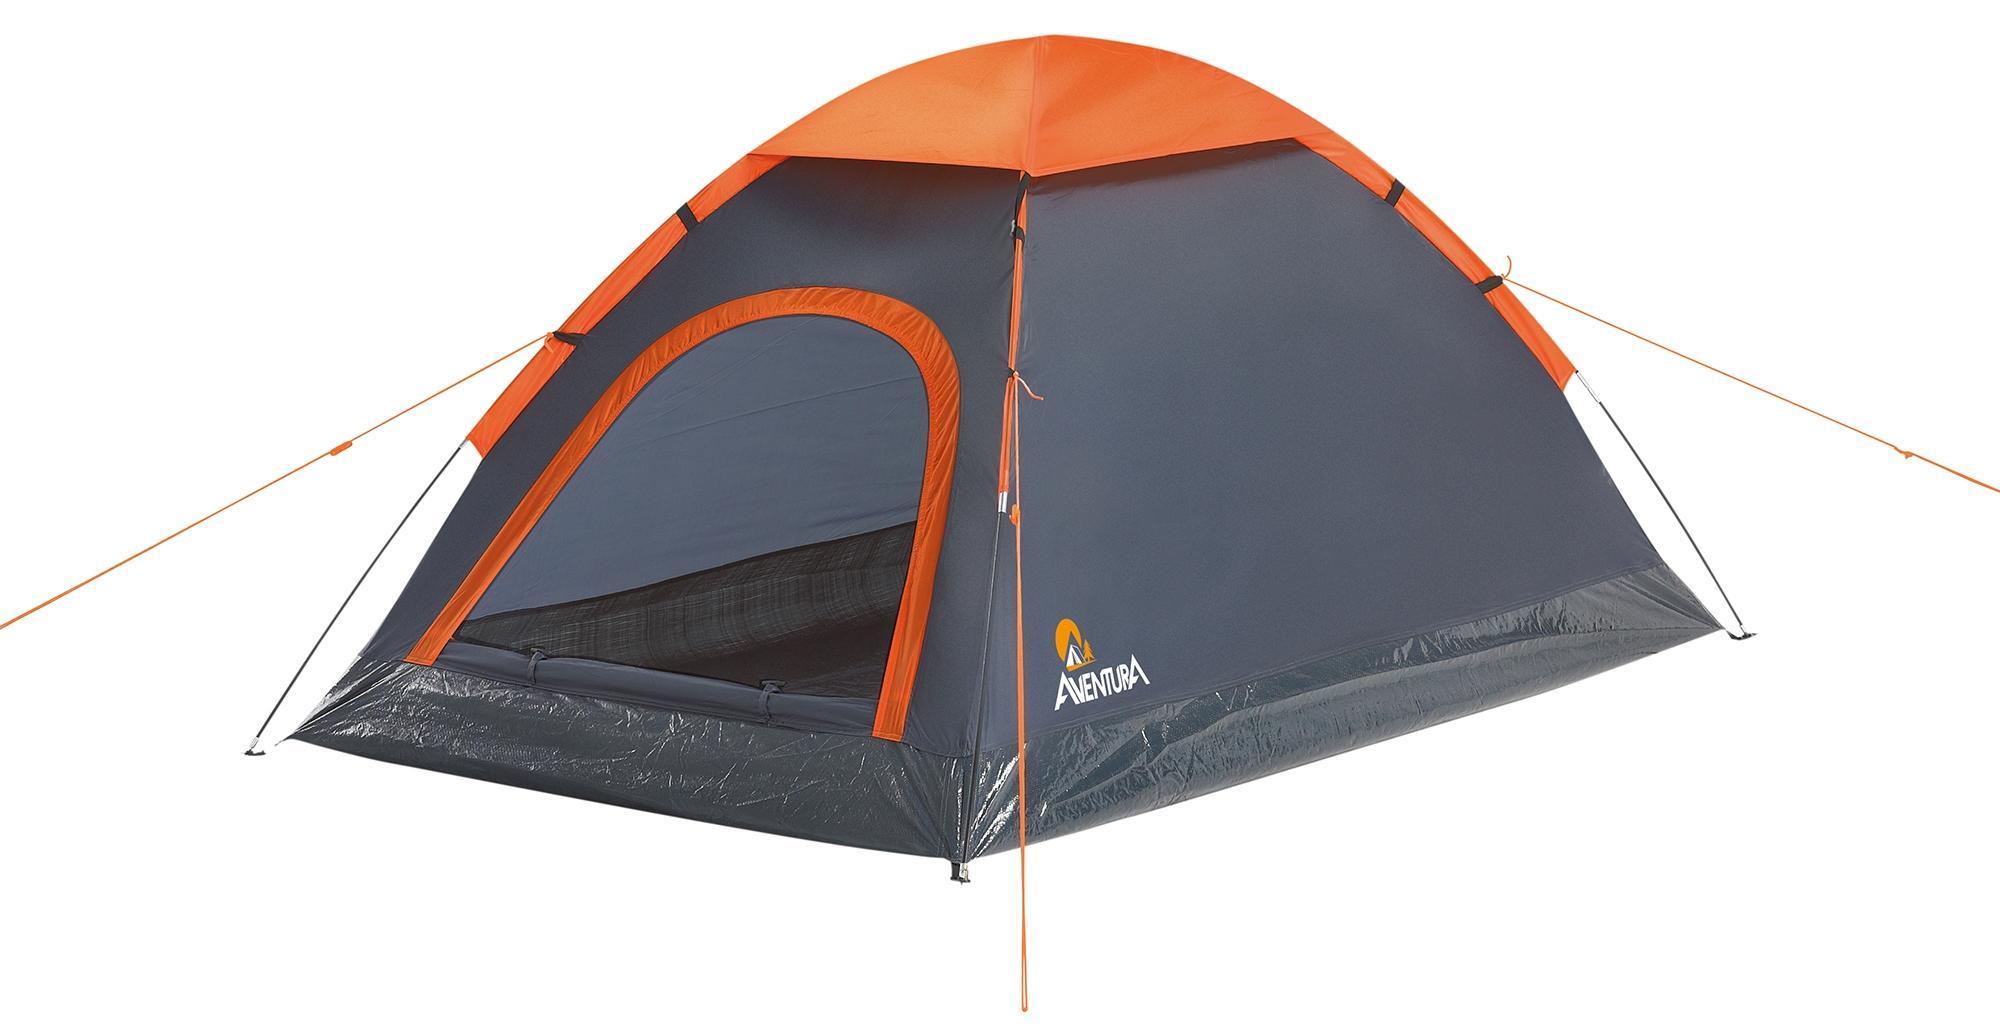 Aventura 4 Man Uncommon Skin Tent